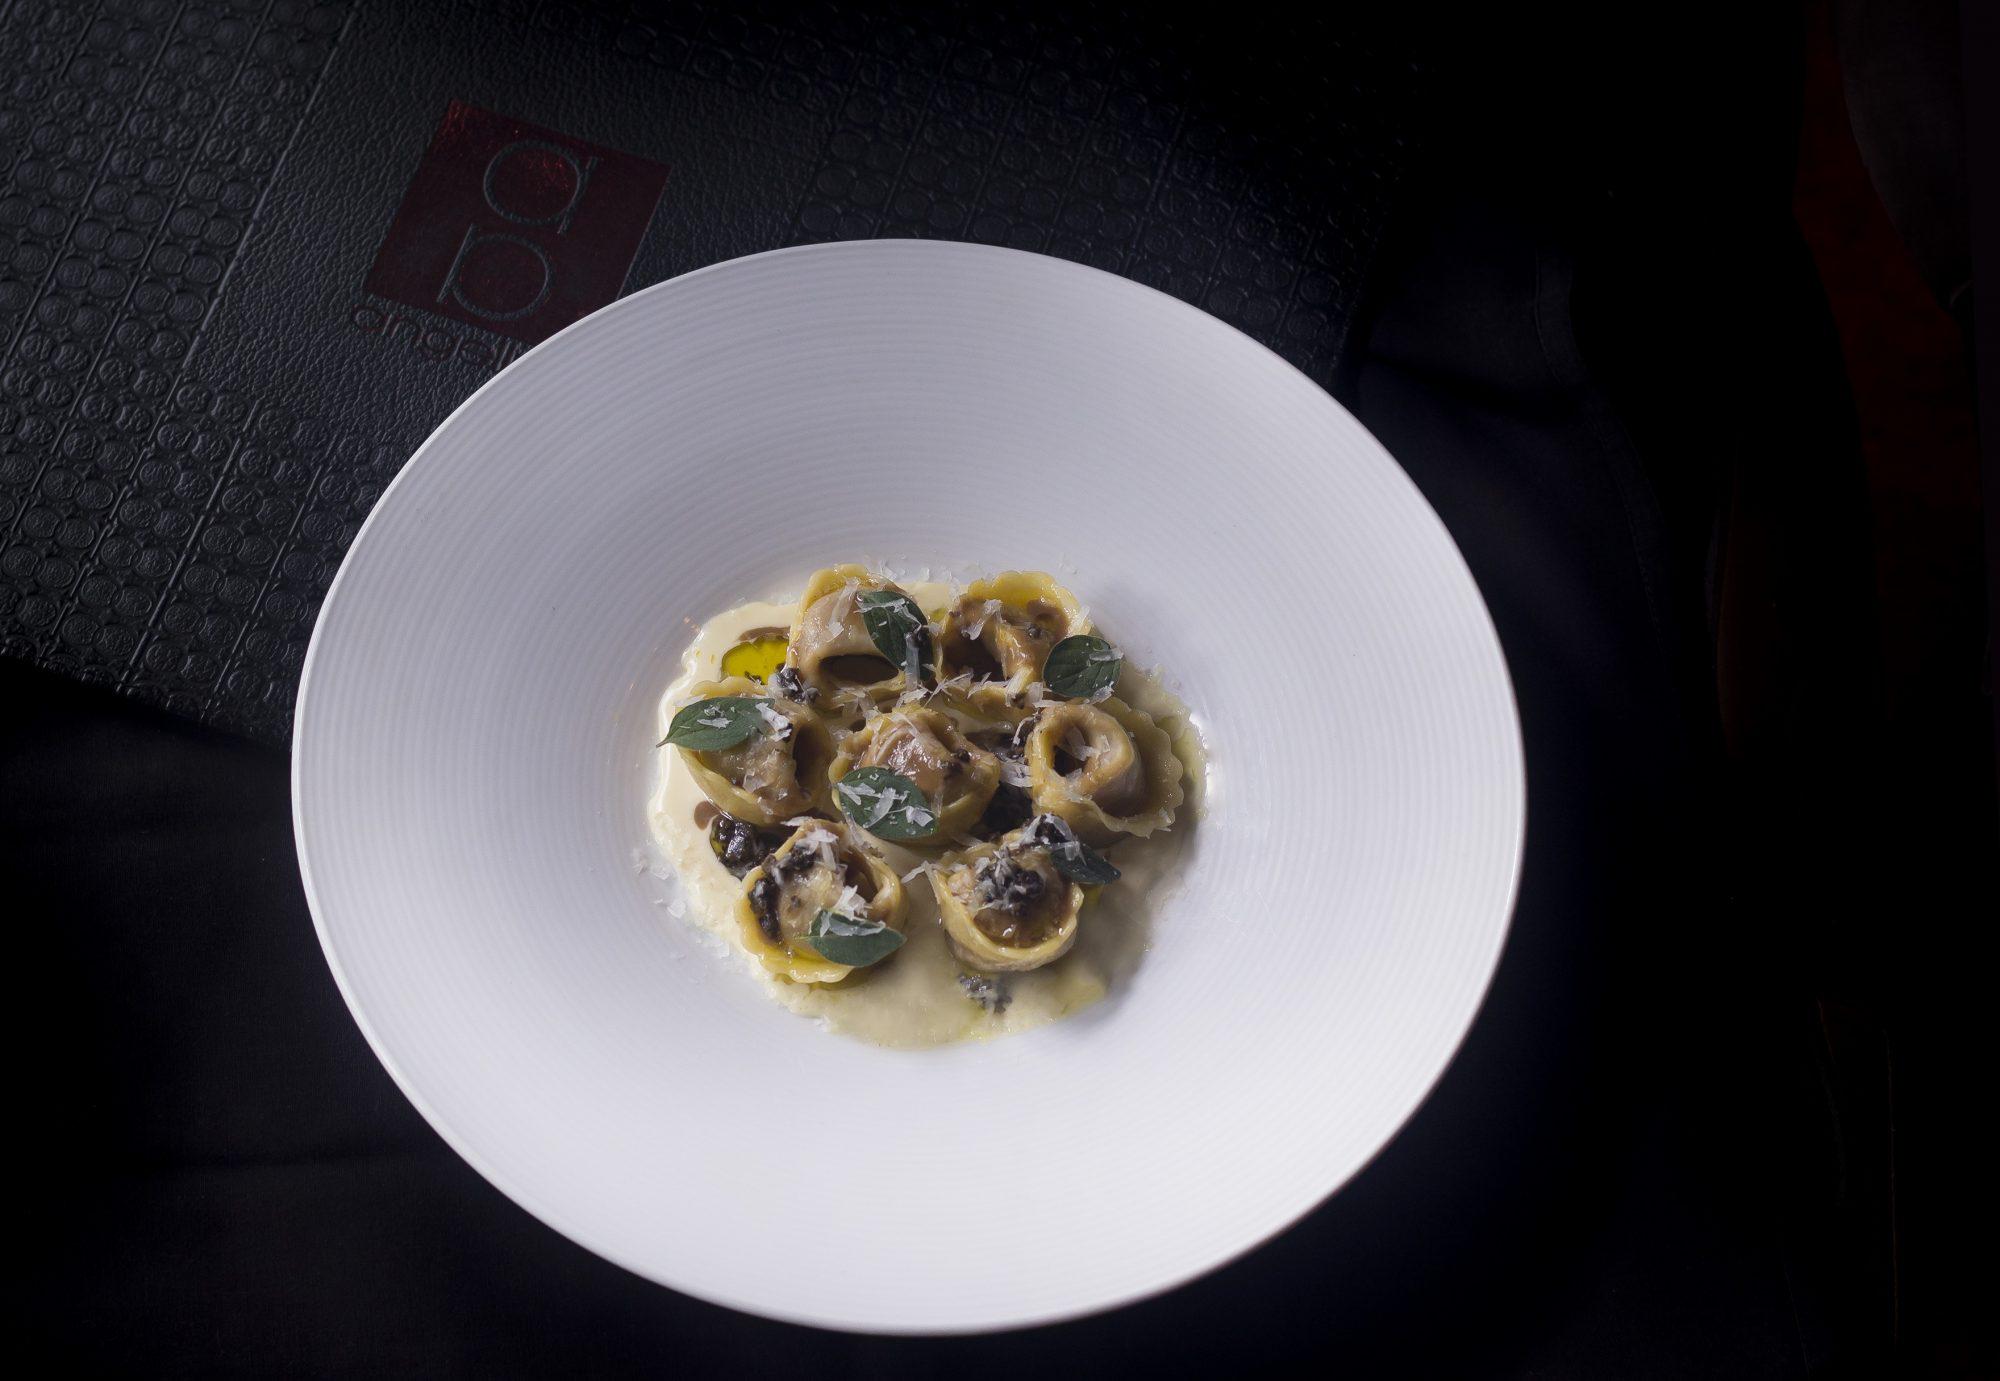 metropole-hanoi-welcomes-italian-guest-chef-de-cuisine